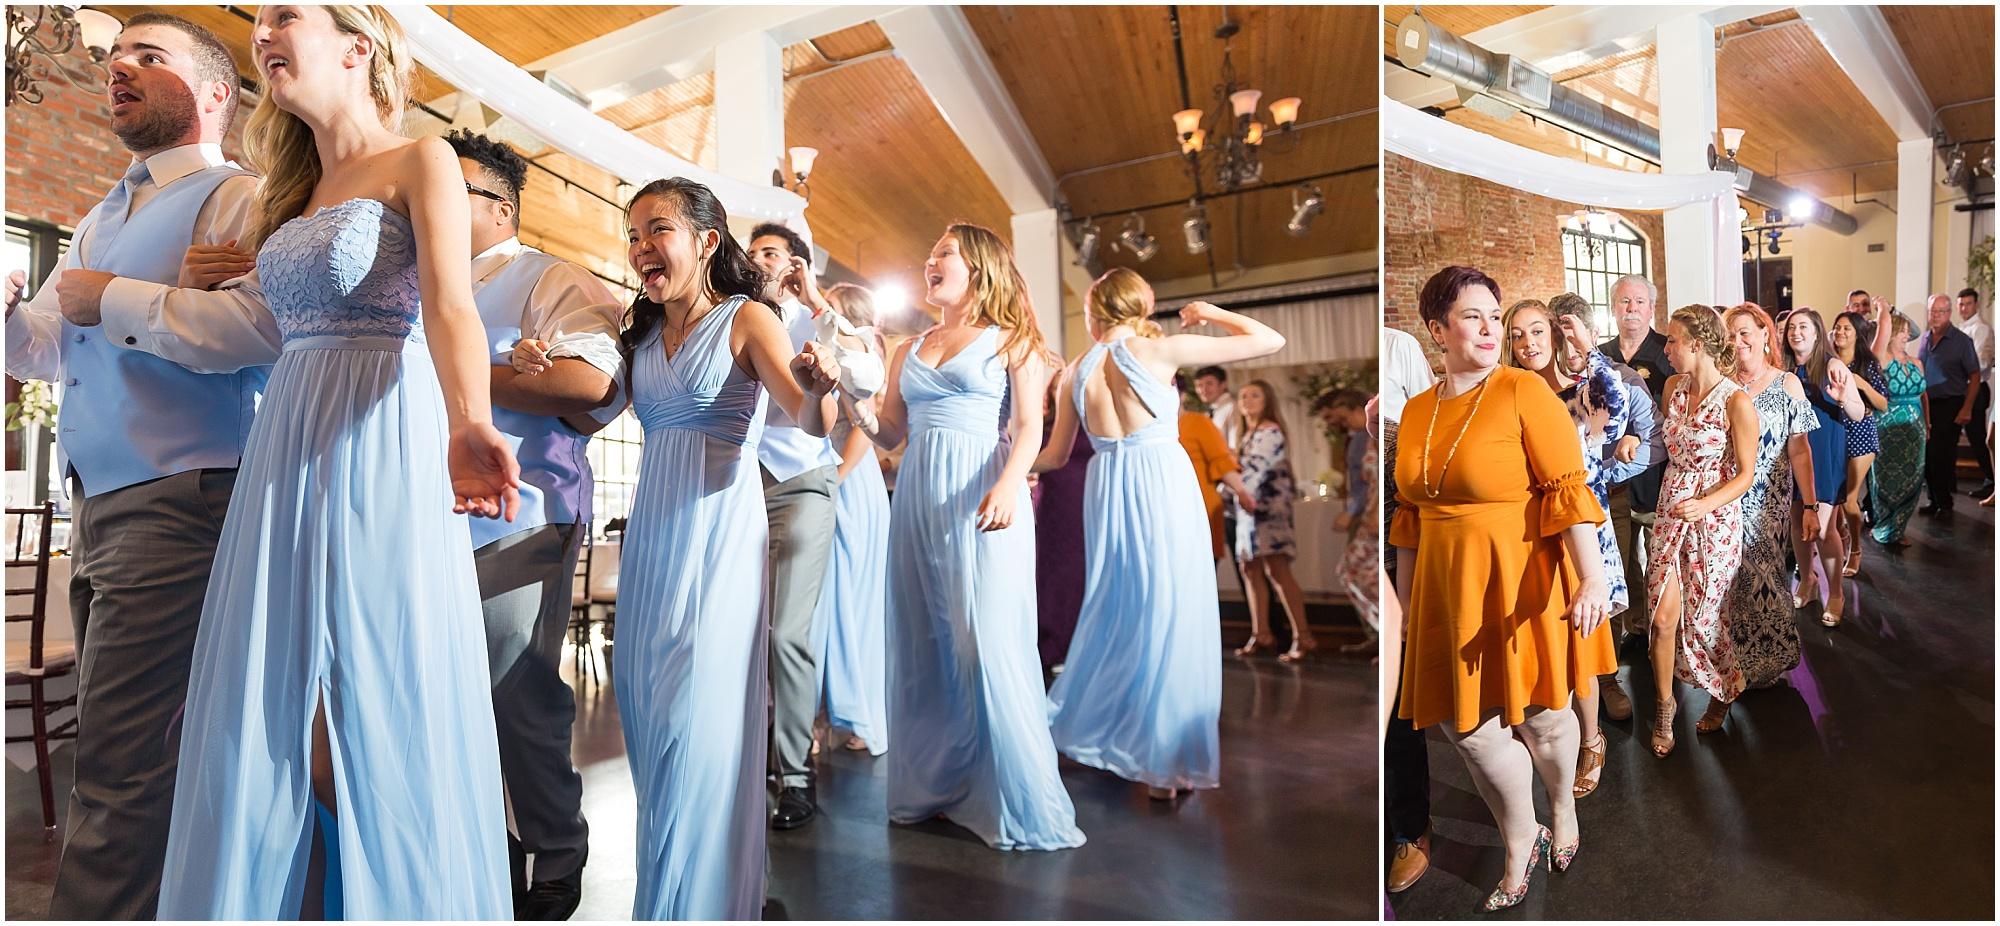 Downtown warehouse wedding in Waco, Texas - www.jasonandmelaina.com